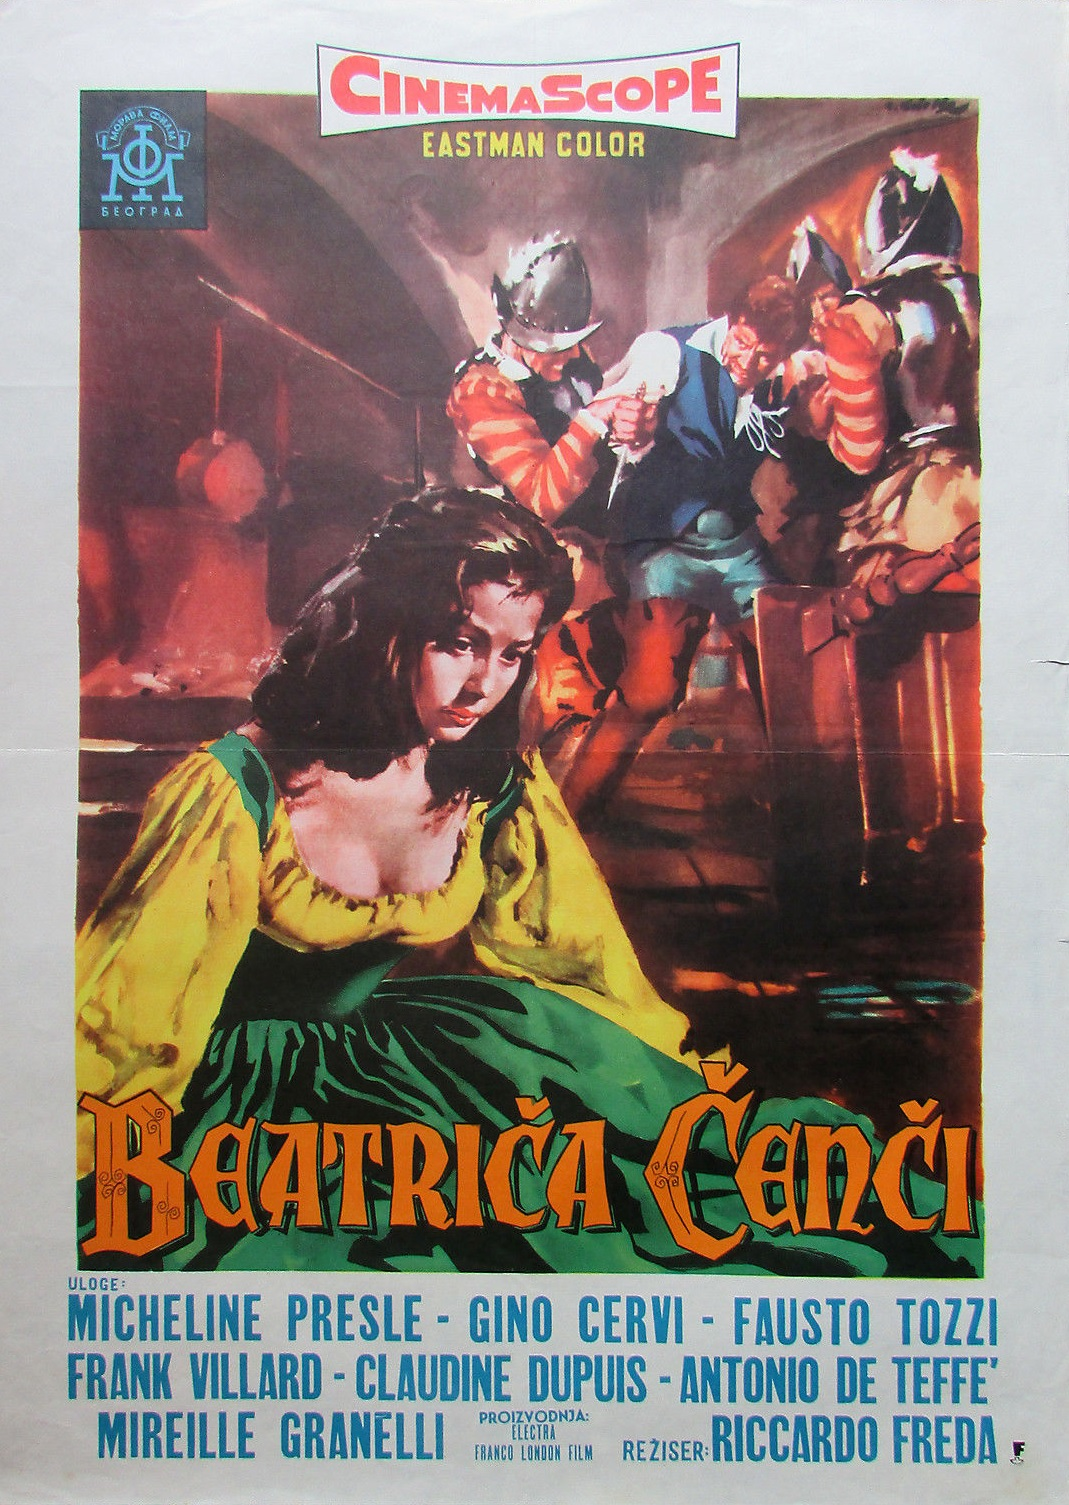 Beatrice Cenci (1956)